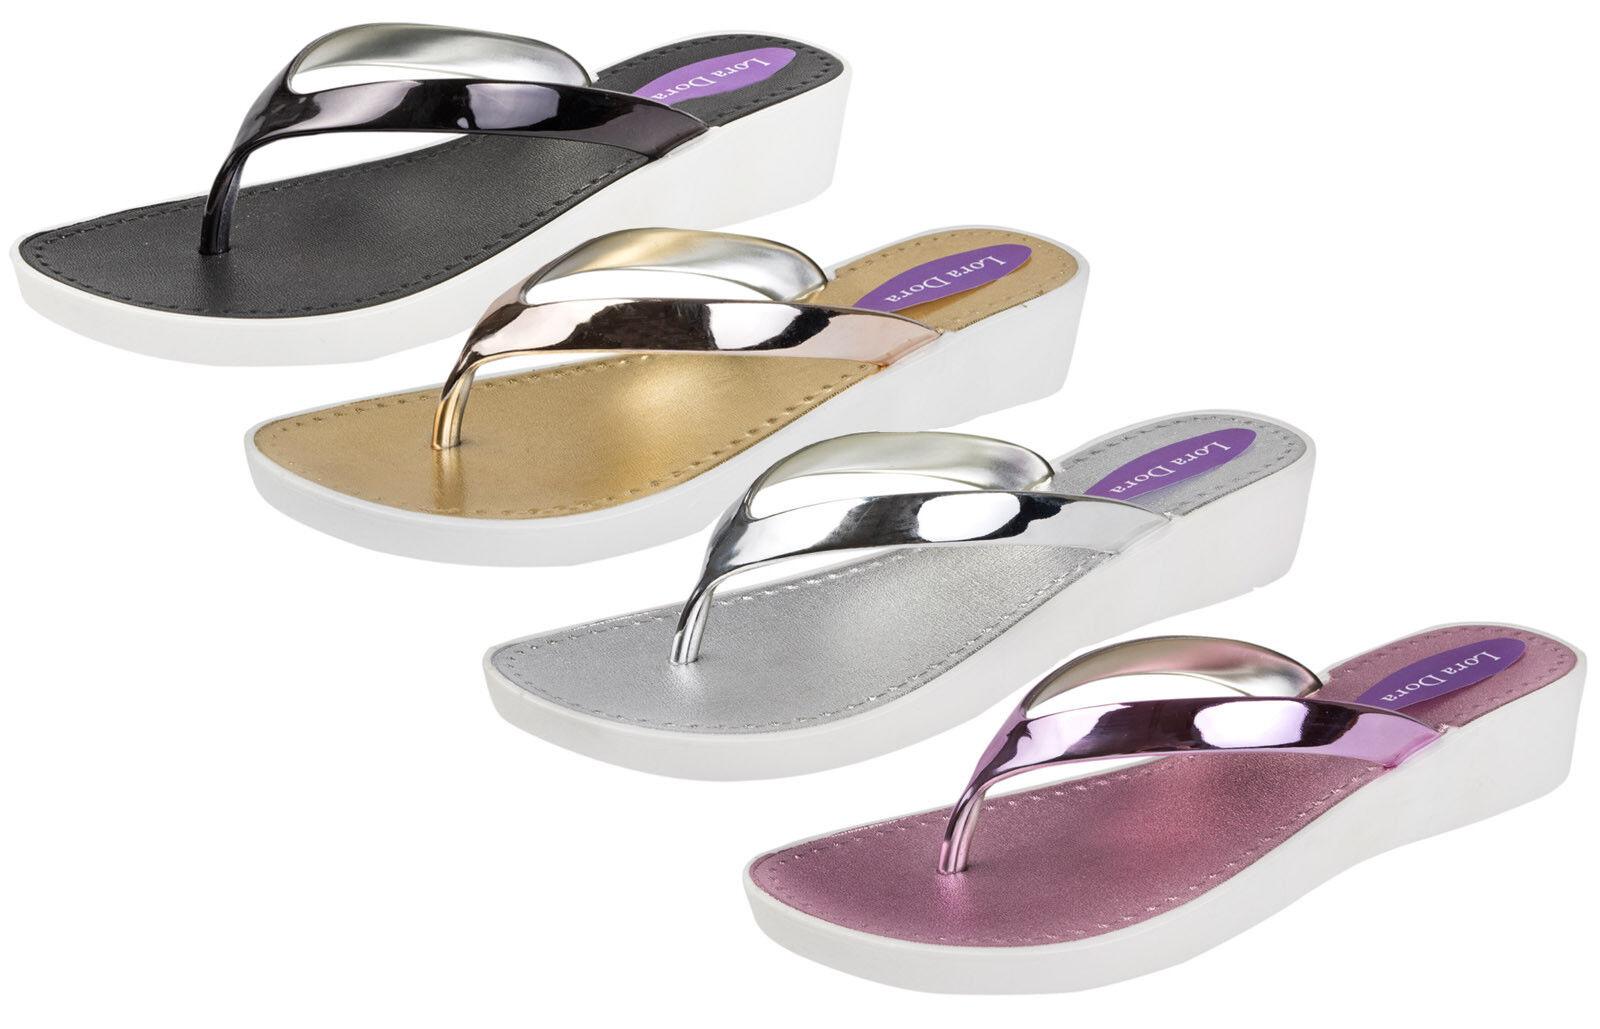 Womens Flip Metallic Low Wedge Sandals Ladies Toe Post Flip Womens Flops Summer Beach Shoes 993927